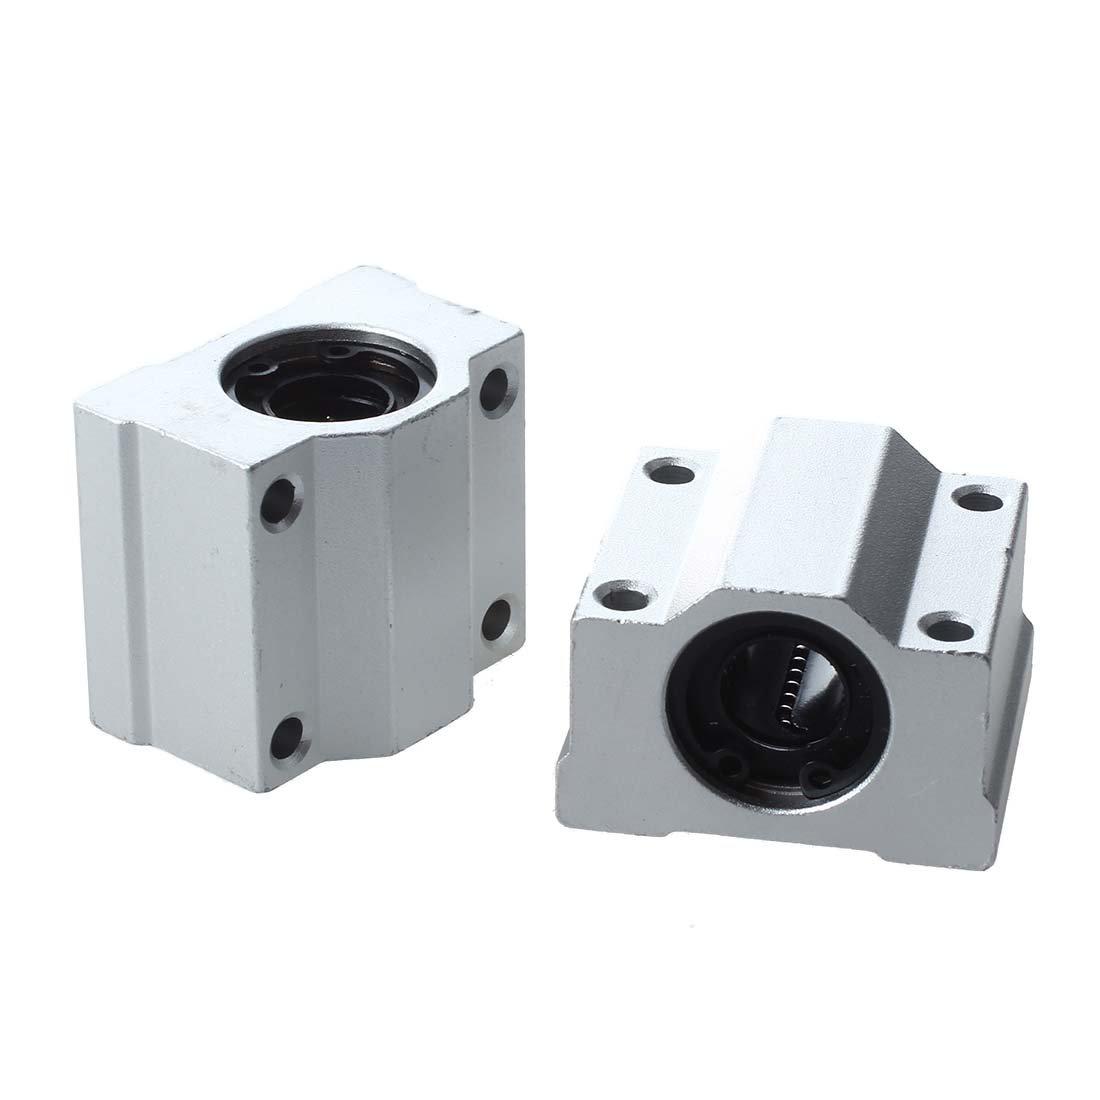 R SODIAL 4 Pcs SC20UU 20mm Aluminum Linear Motion Ball Bearing Slide Bushing for CNC Linear Motion Ball Bearing